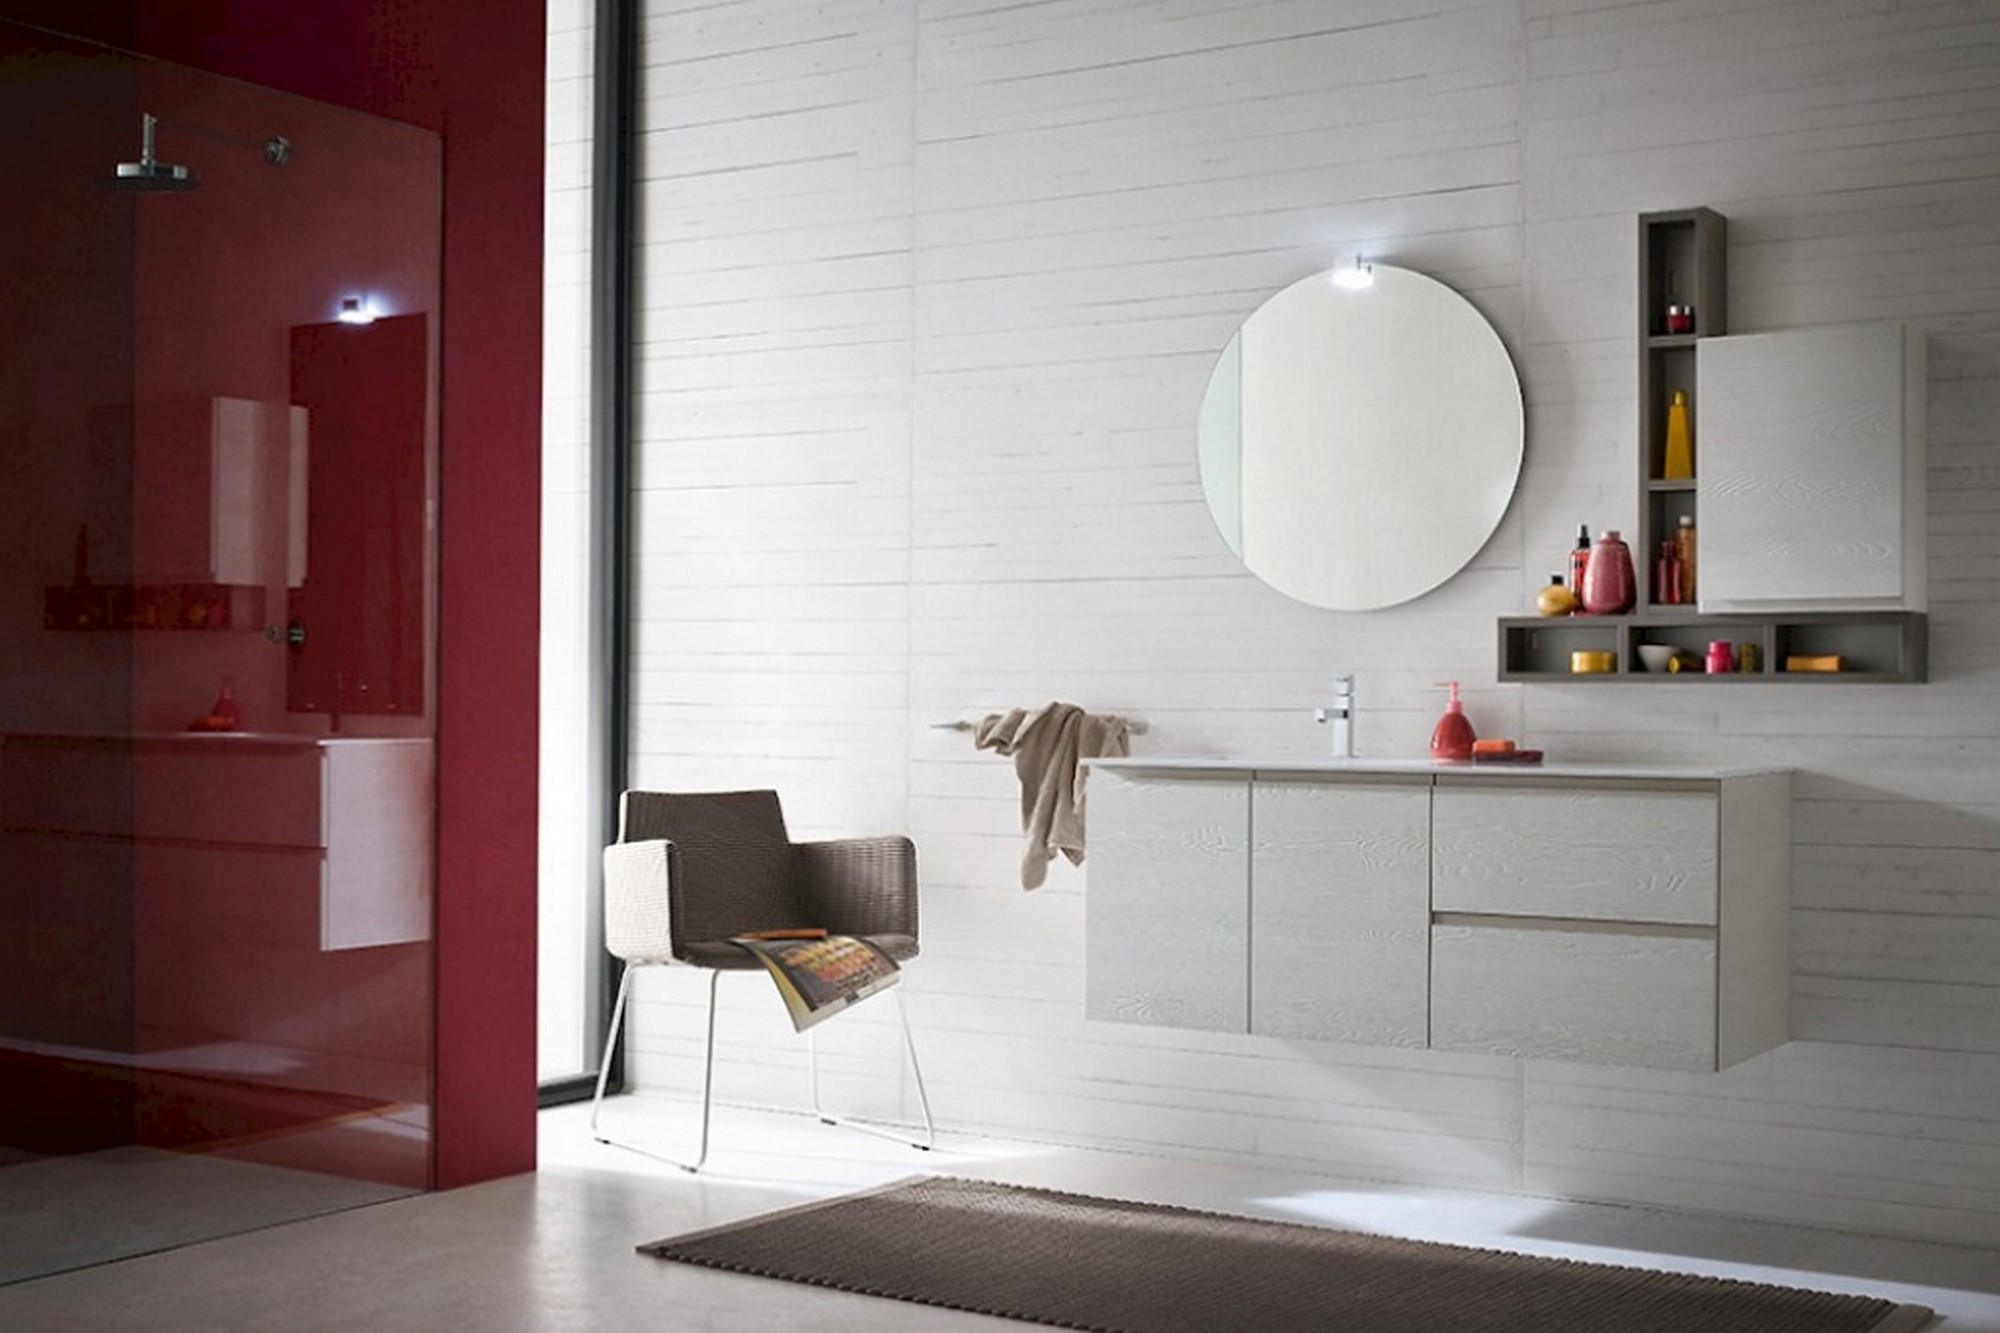 Arredo bagno mobilificio Cominazzi Cavallirio - Novara